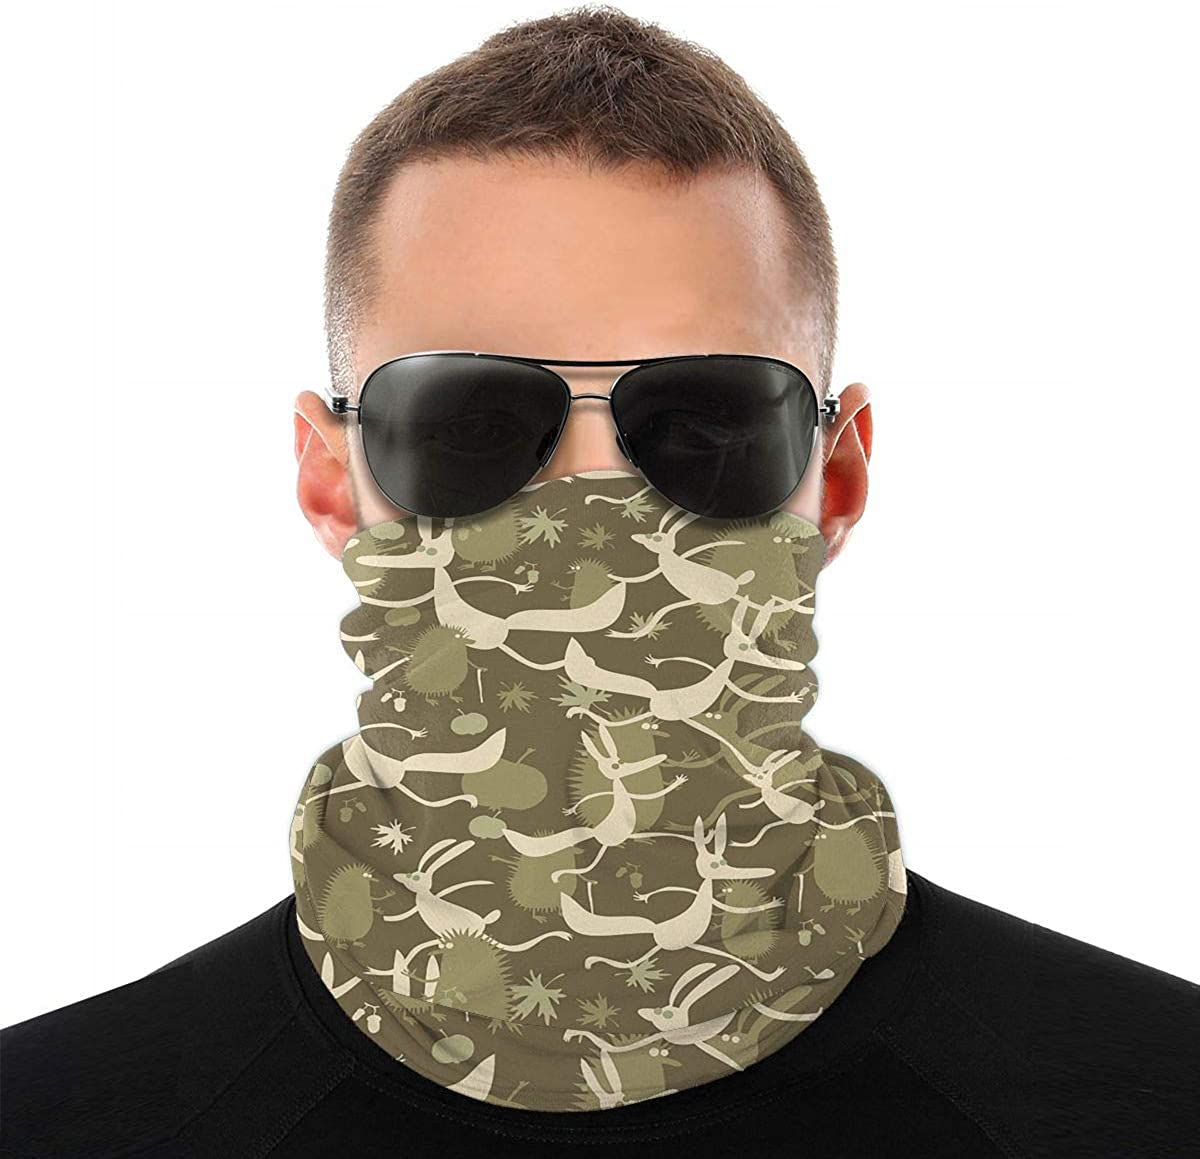 KiuLoam Funny Childish Camouflage Seamless Face Mask Bandanas Neck Gaiter for Men and Women, Multifunction Headband Scarf for Dust, Outdoors, Sports